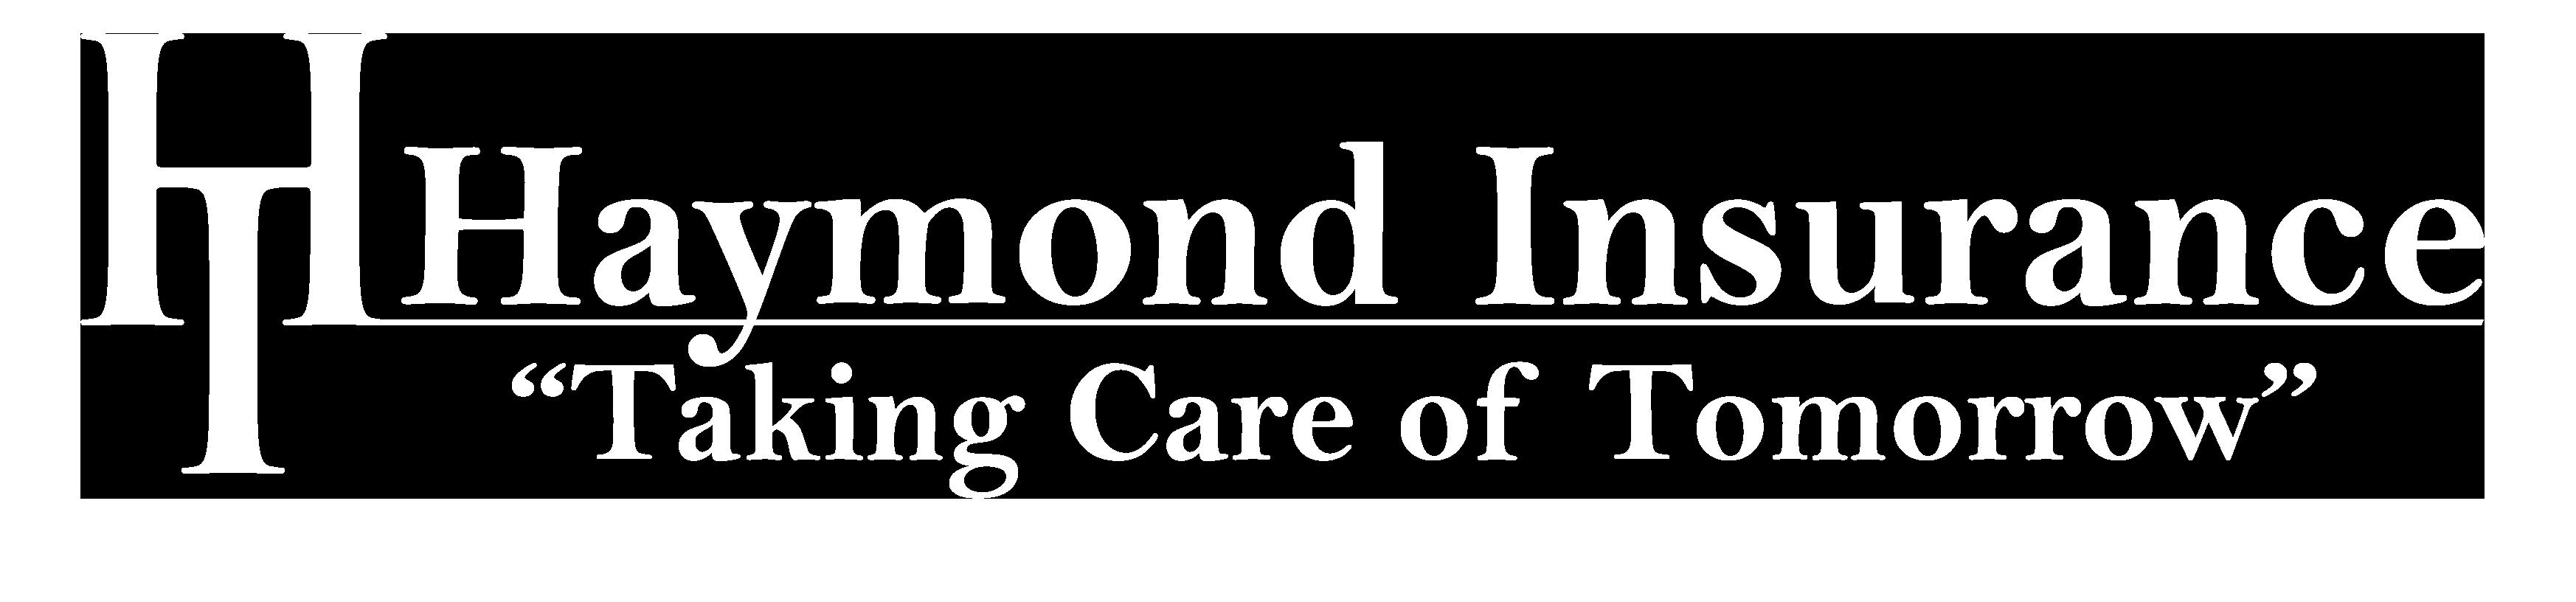 Haymond Insurance, Inc.